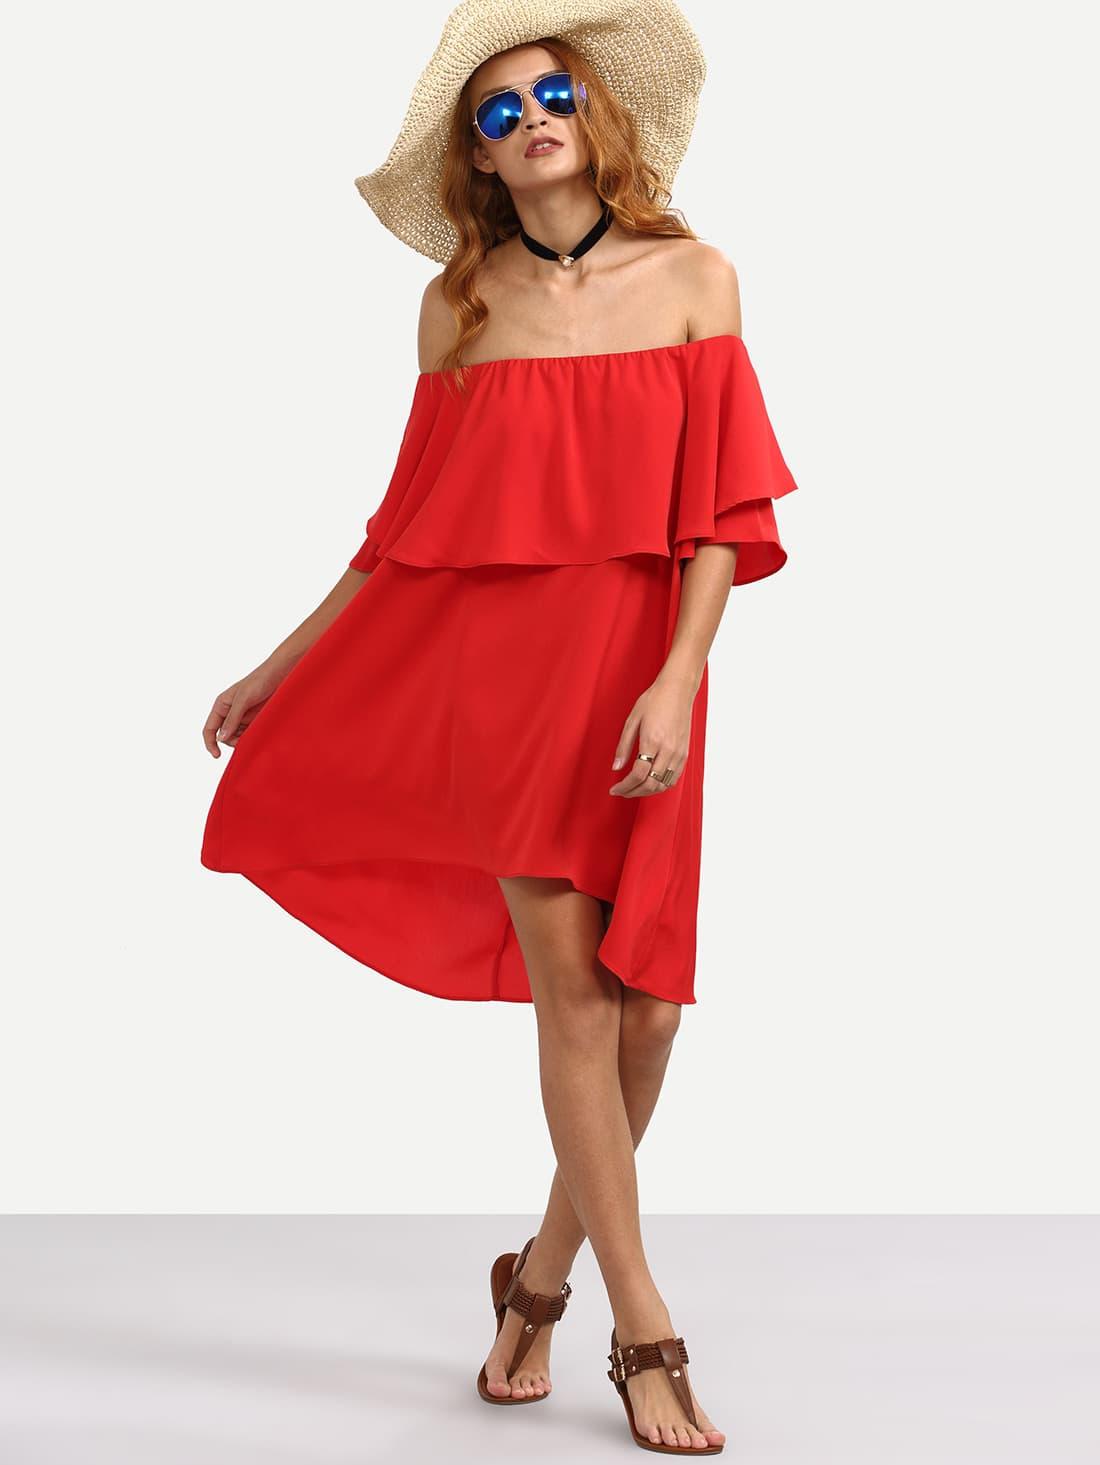 Red Ruffle Off The Shoulder Asymmetrical Dress dress160531502